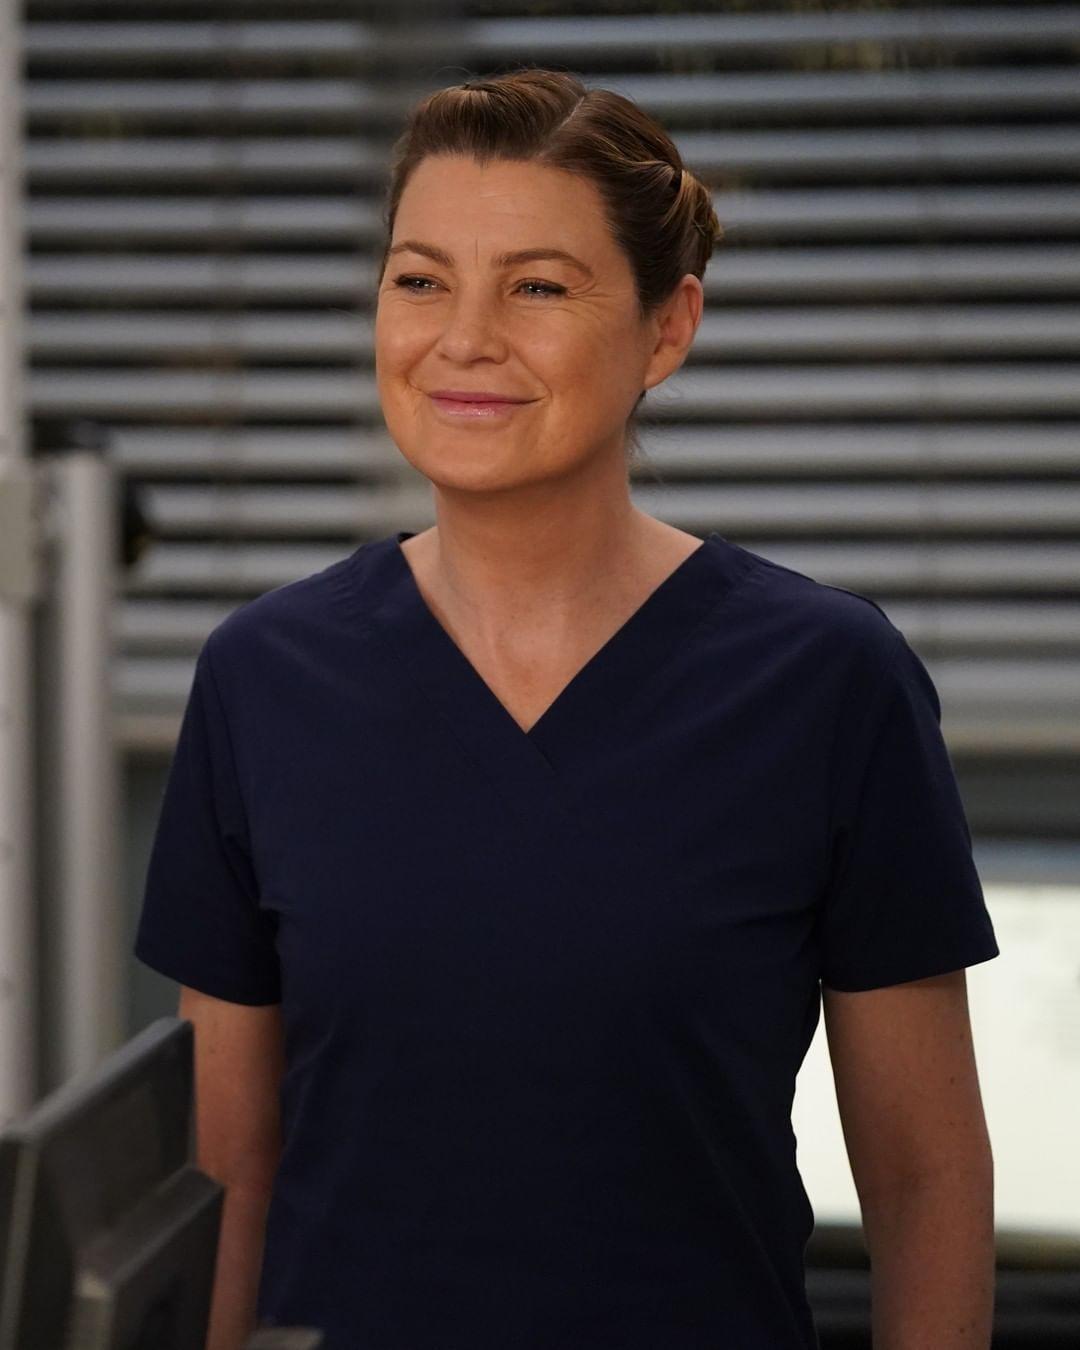 A photo of Ellen Pompeo in scrubs